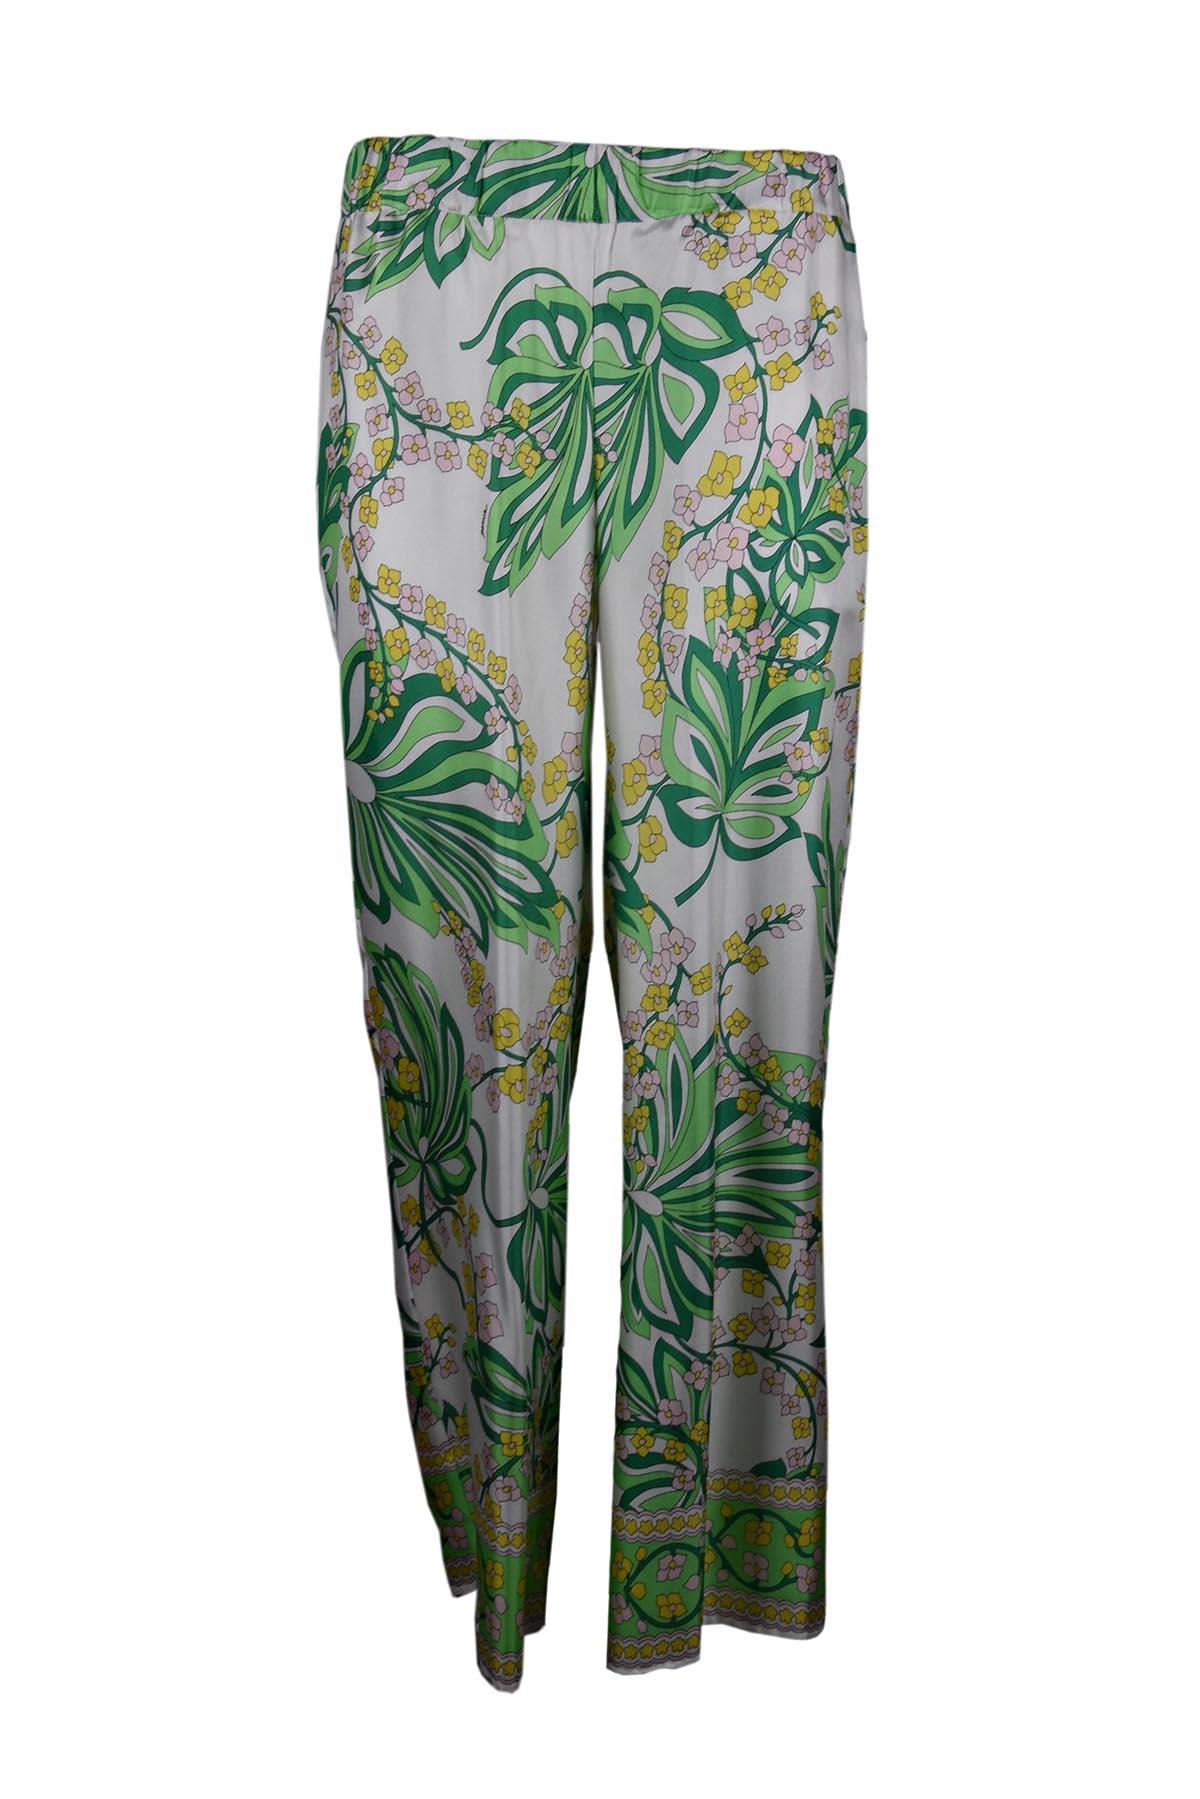 Parosh Pijama Pants